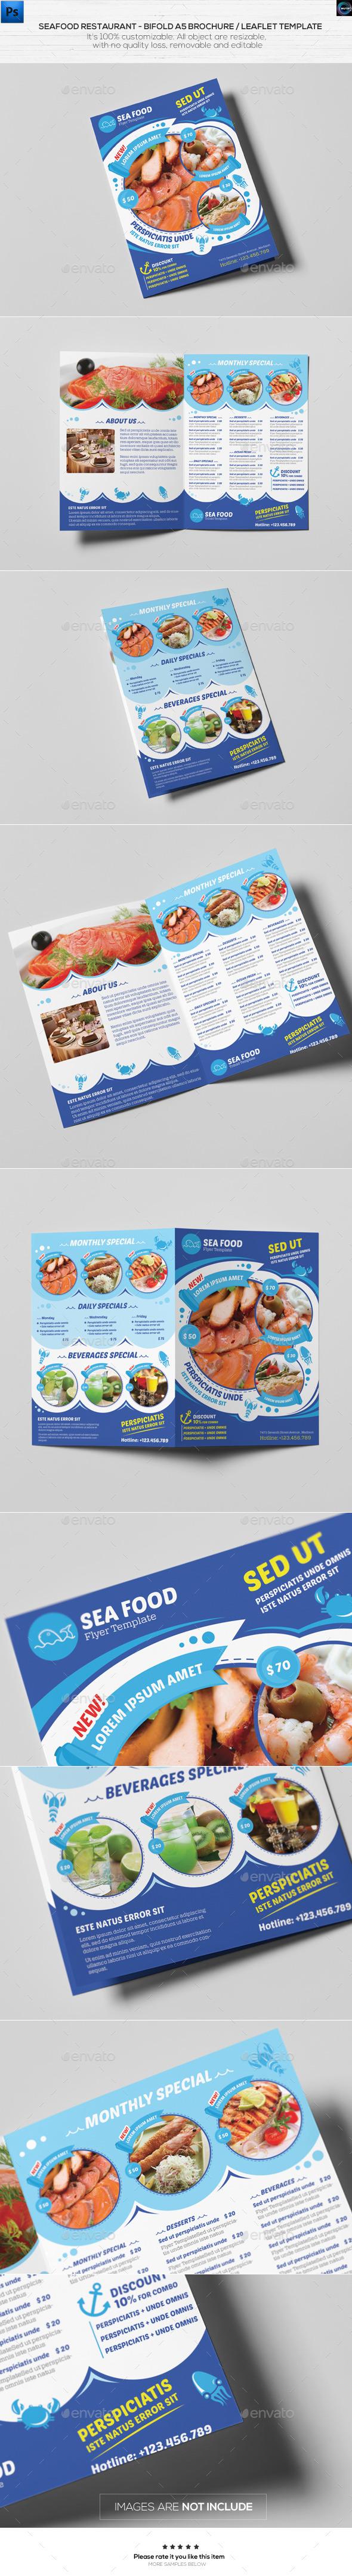 Seafood Restaurant-A5 Brochure/Leaflet Template - Catalogs Brochures